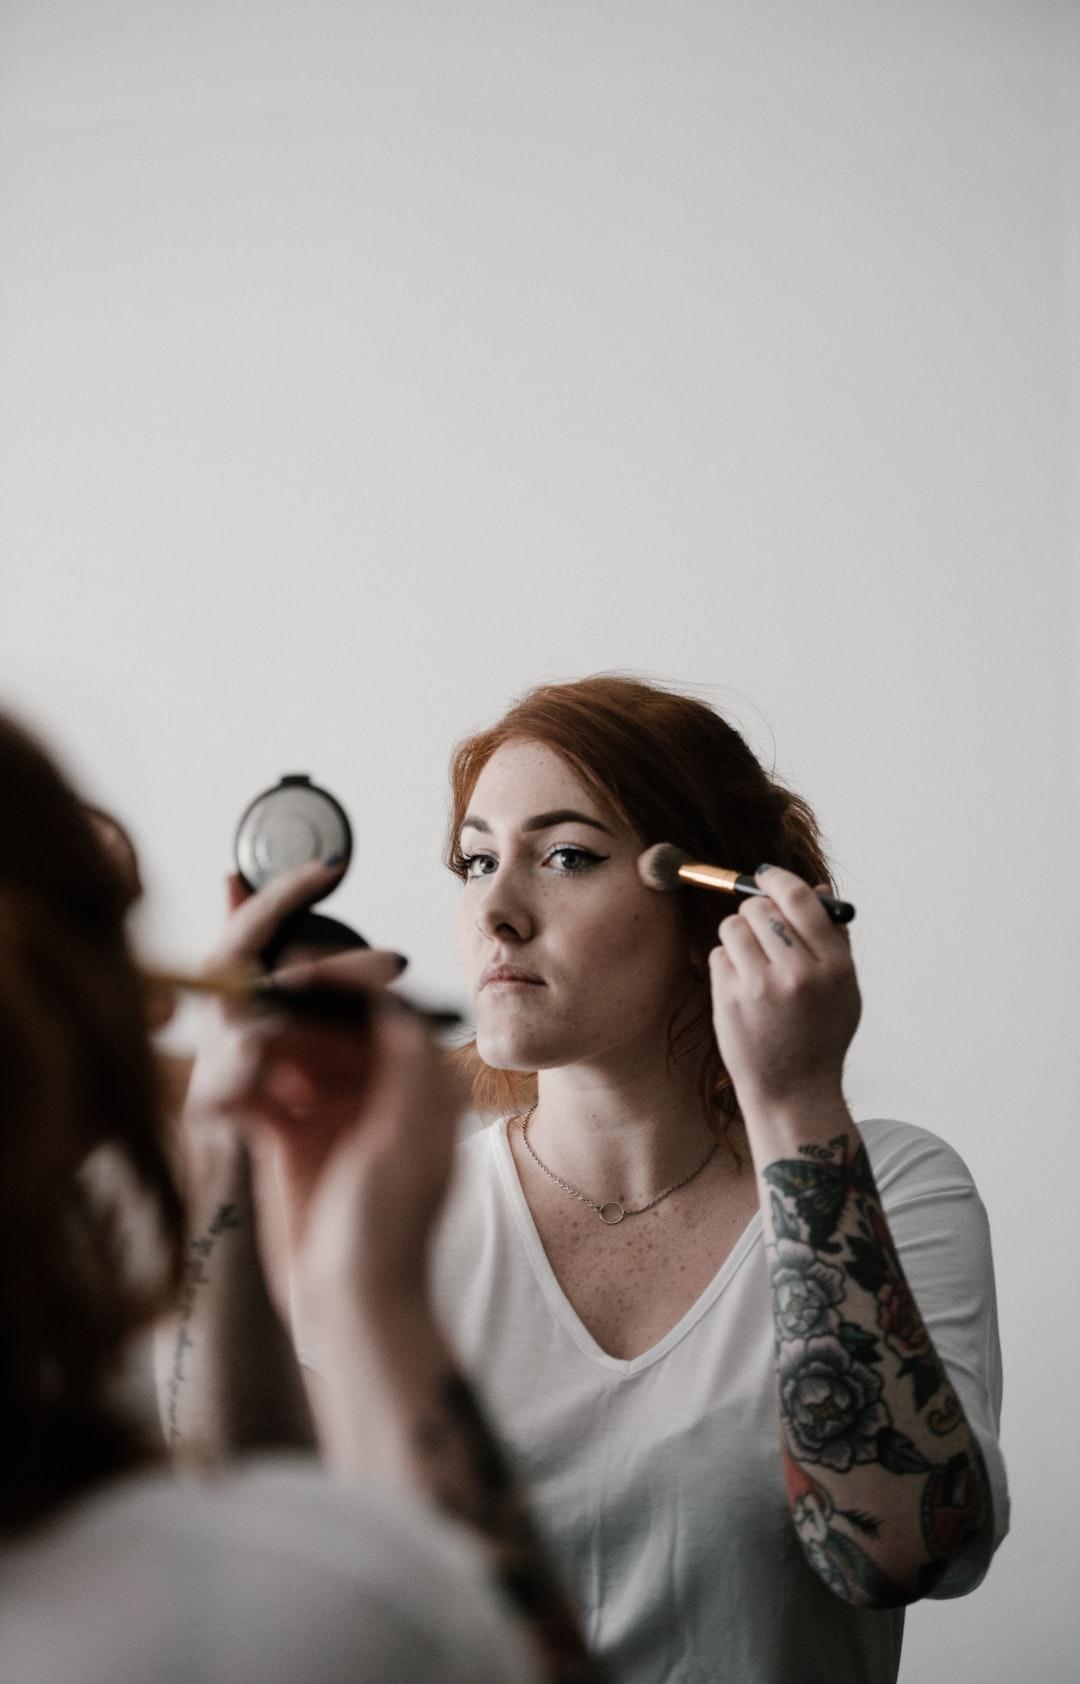 Woman applying blusher / highlighter, make up